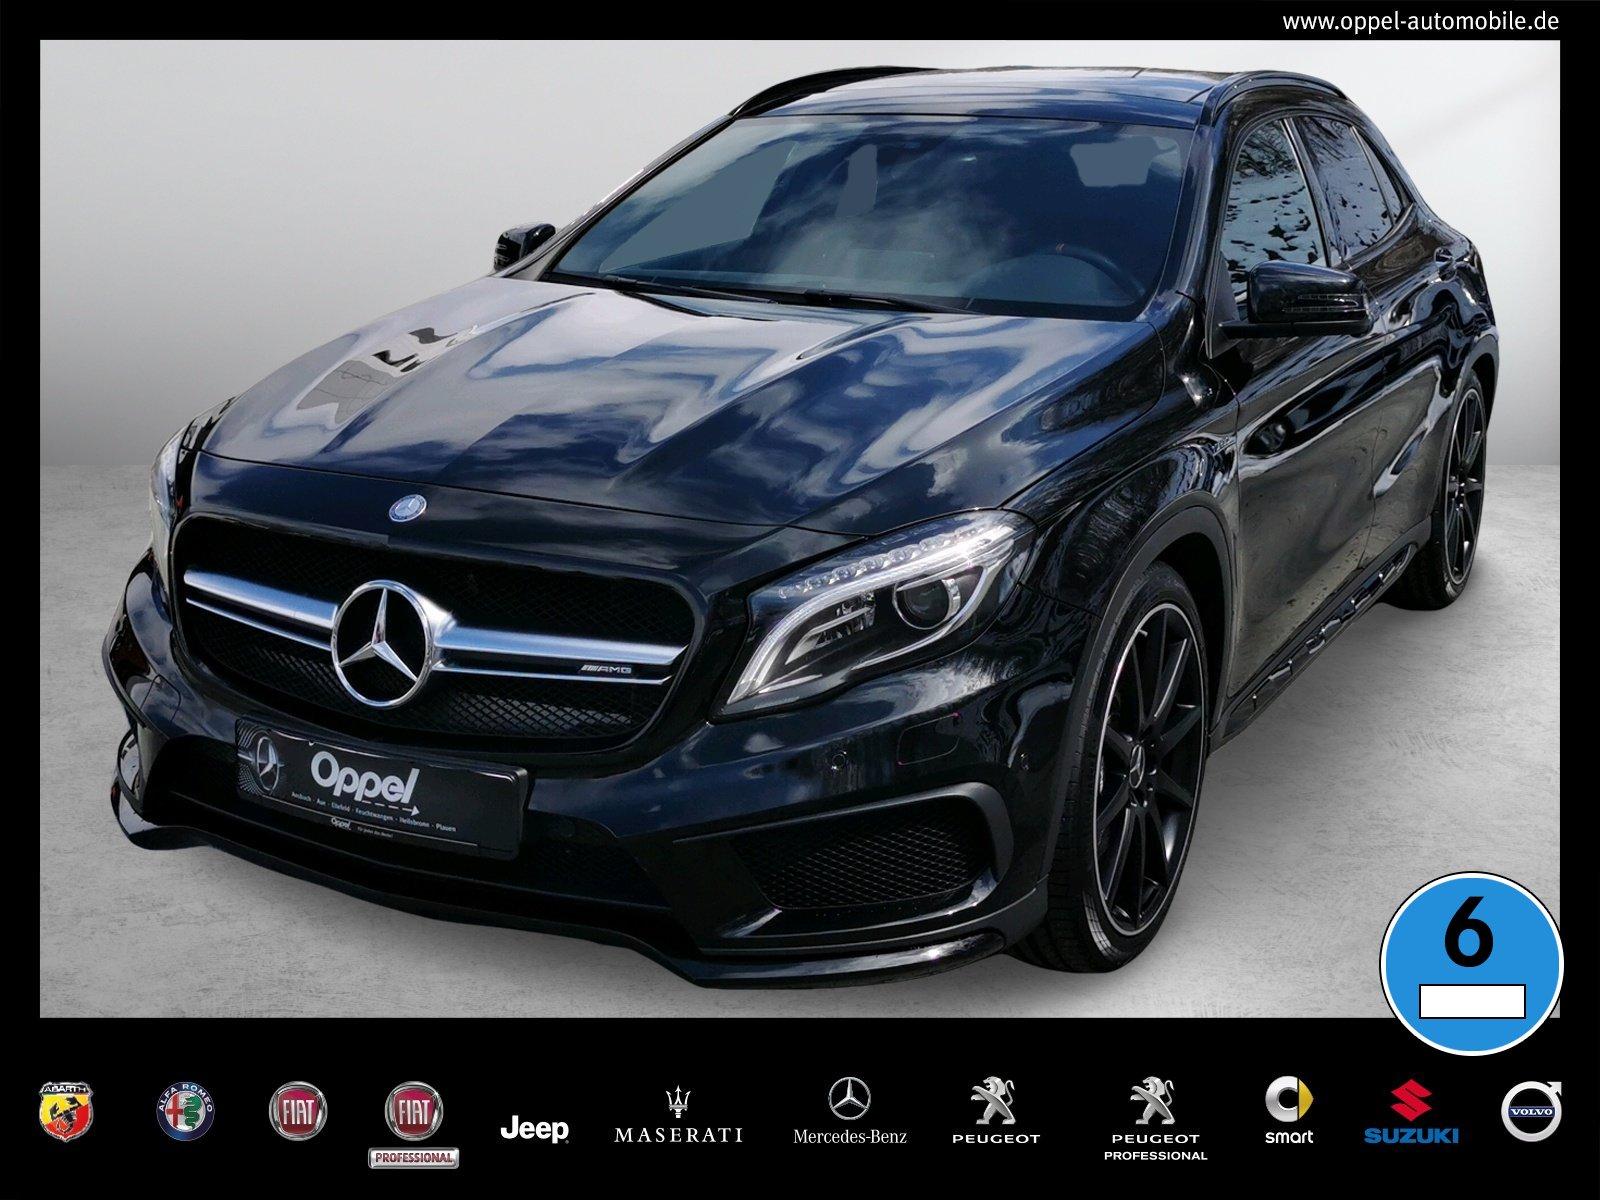 Mercedes-Benz GLA 45 AMG 4Matic ++AMG+PANORAMA+TEMPOMAT+XENON+, Jahr 2016, Benzin